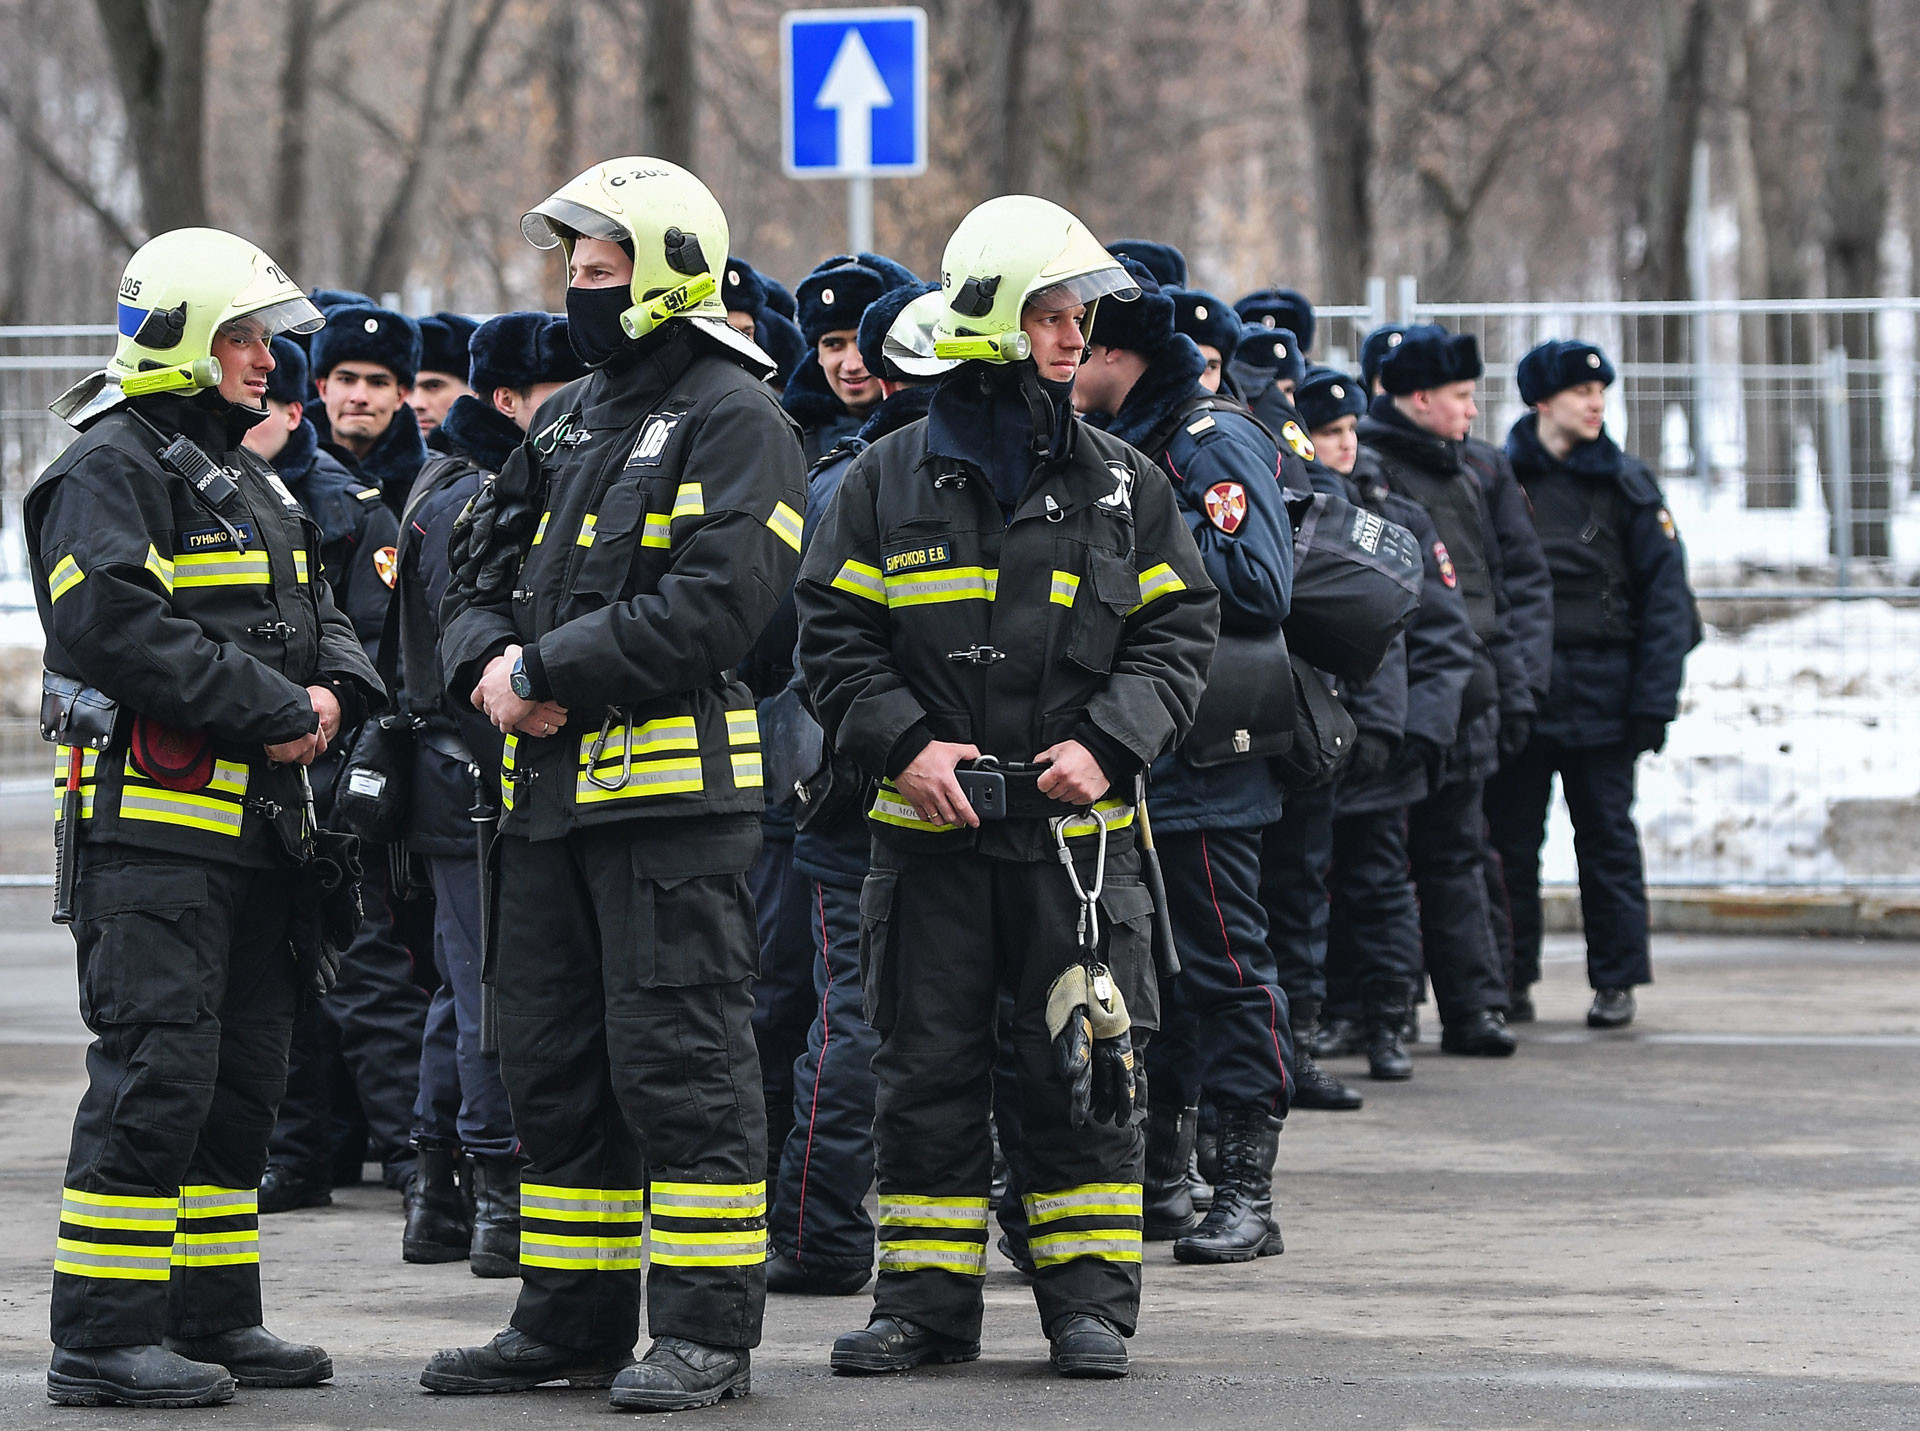 Фото: © РИА Новости / Владимир Песня